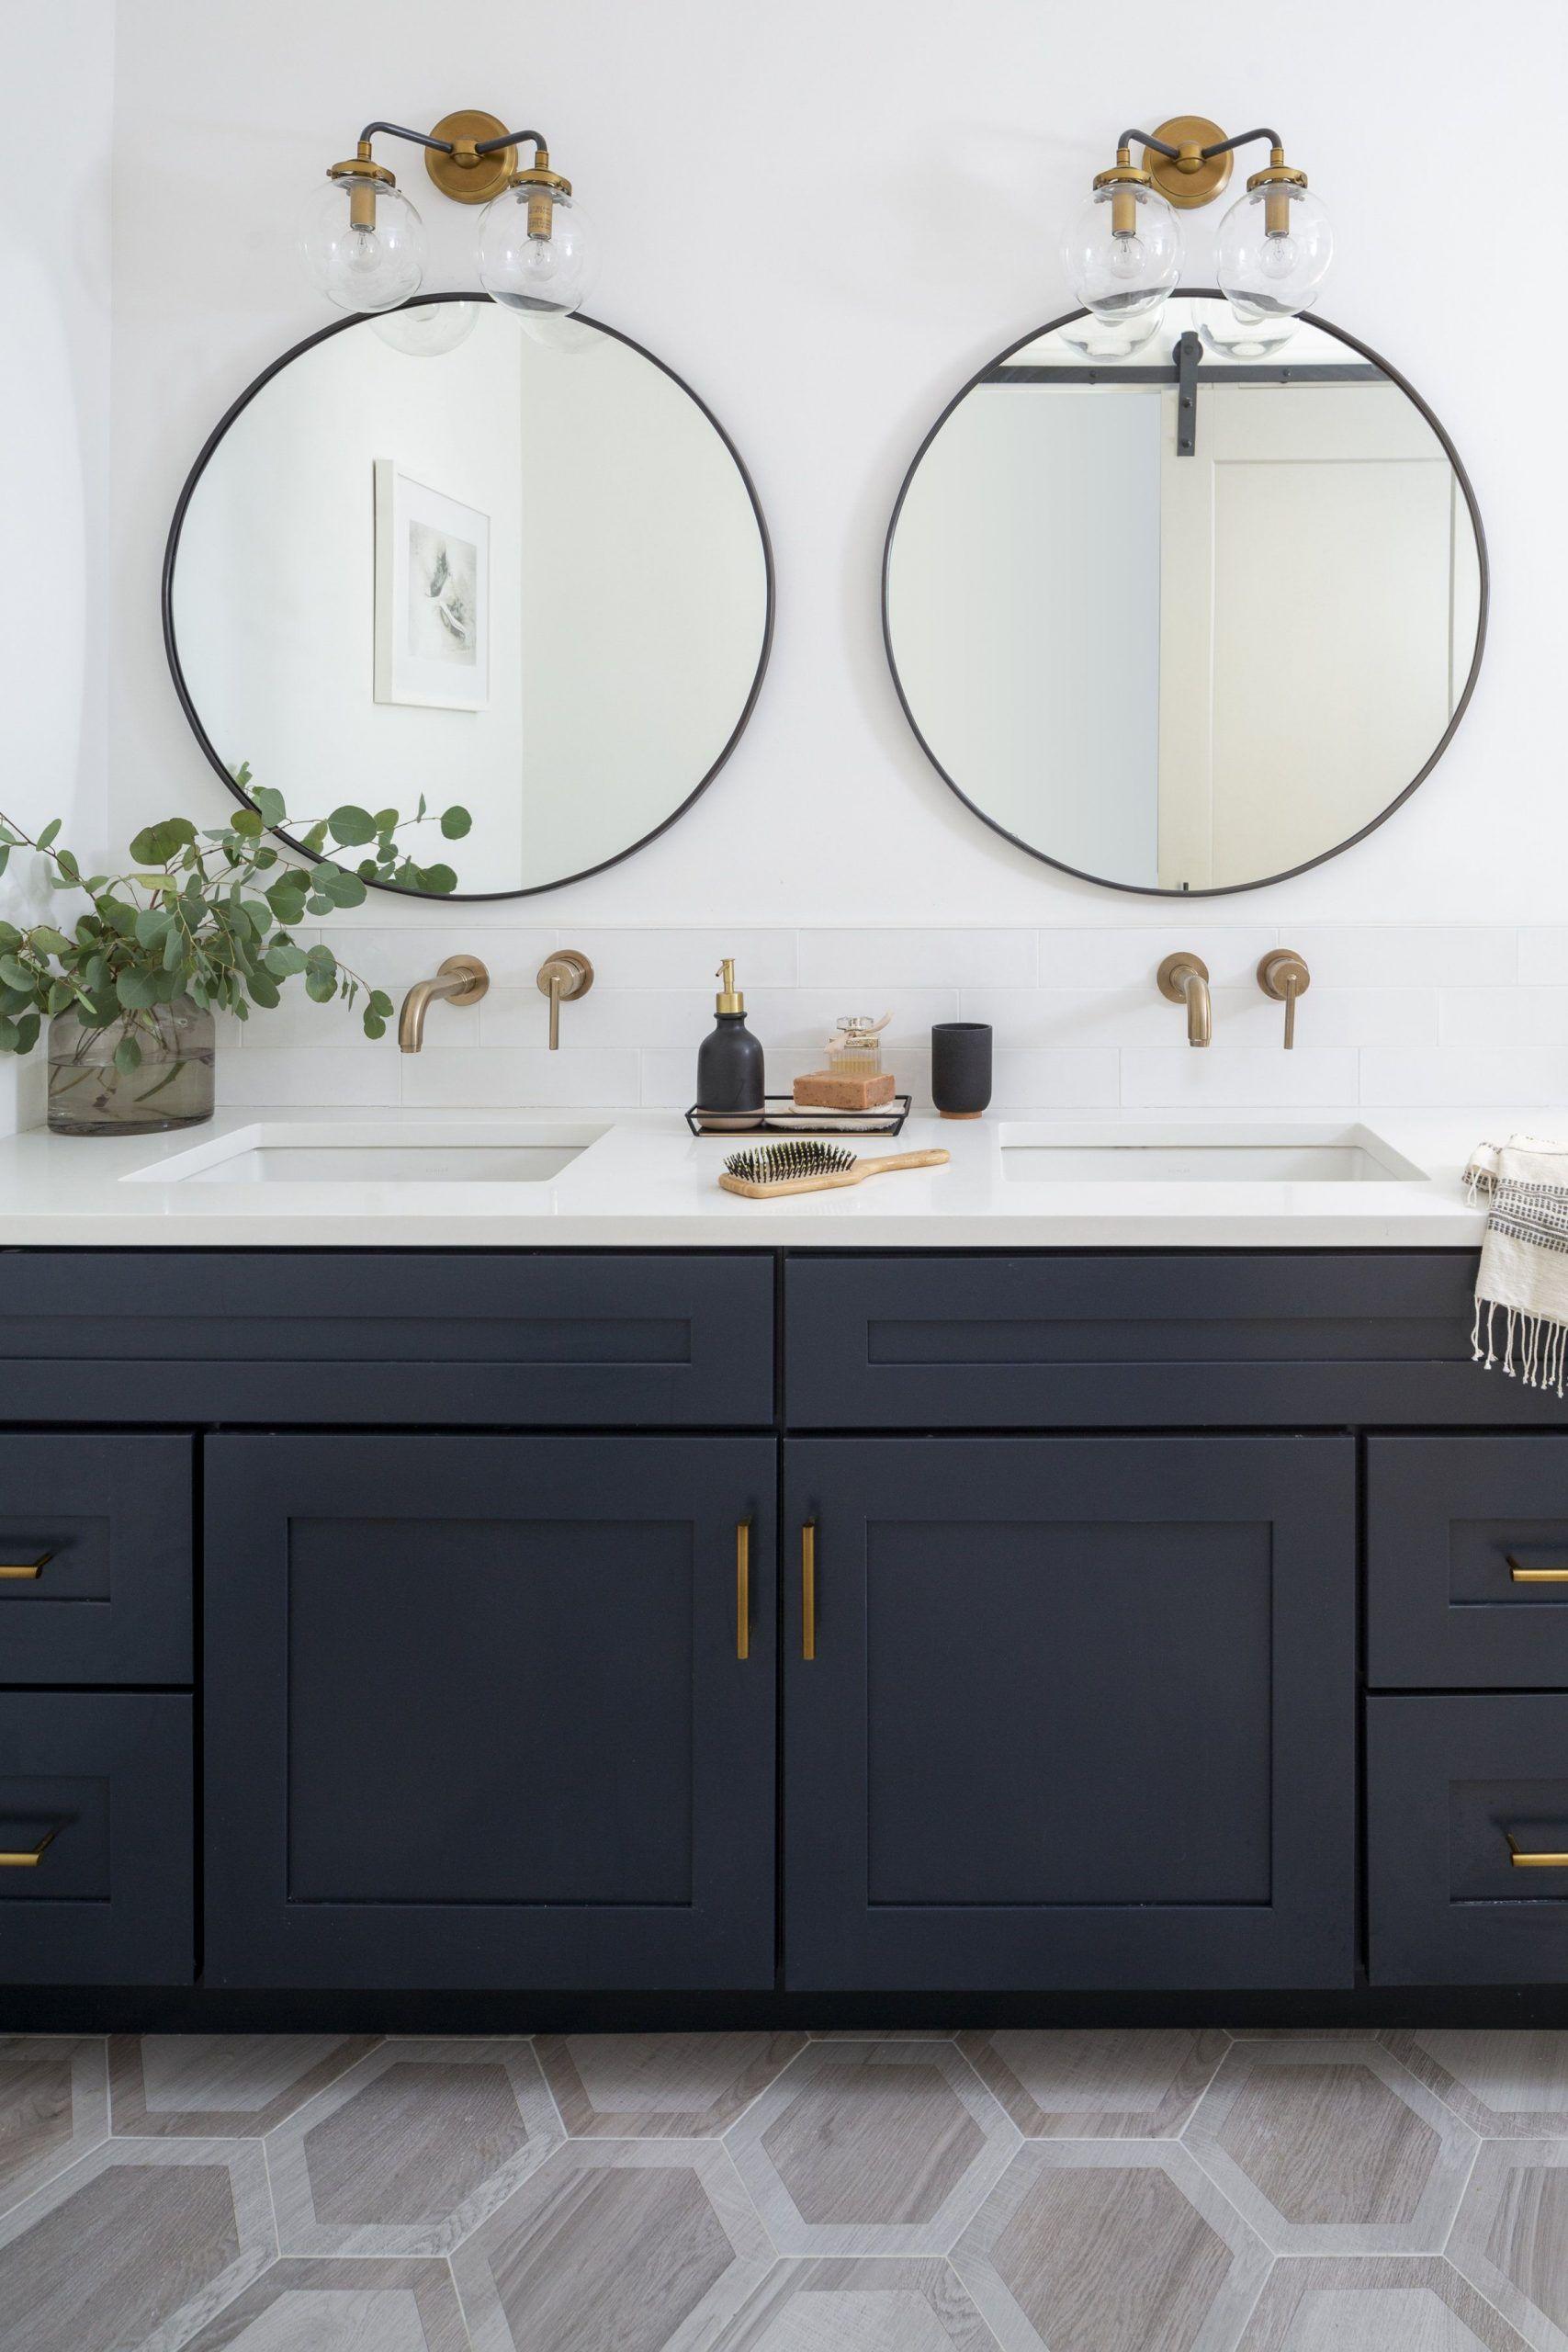 5 Most Popularity Double Sink Bathroom Vanity Ideas Vankkids Com Round Mirror Bathroom Farmhouse Bathroom Decor Double Vanity Bathroom [ 2560 x 1707 Pixel ]